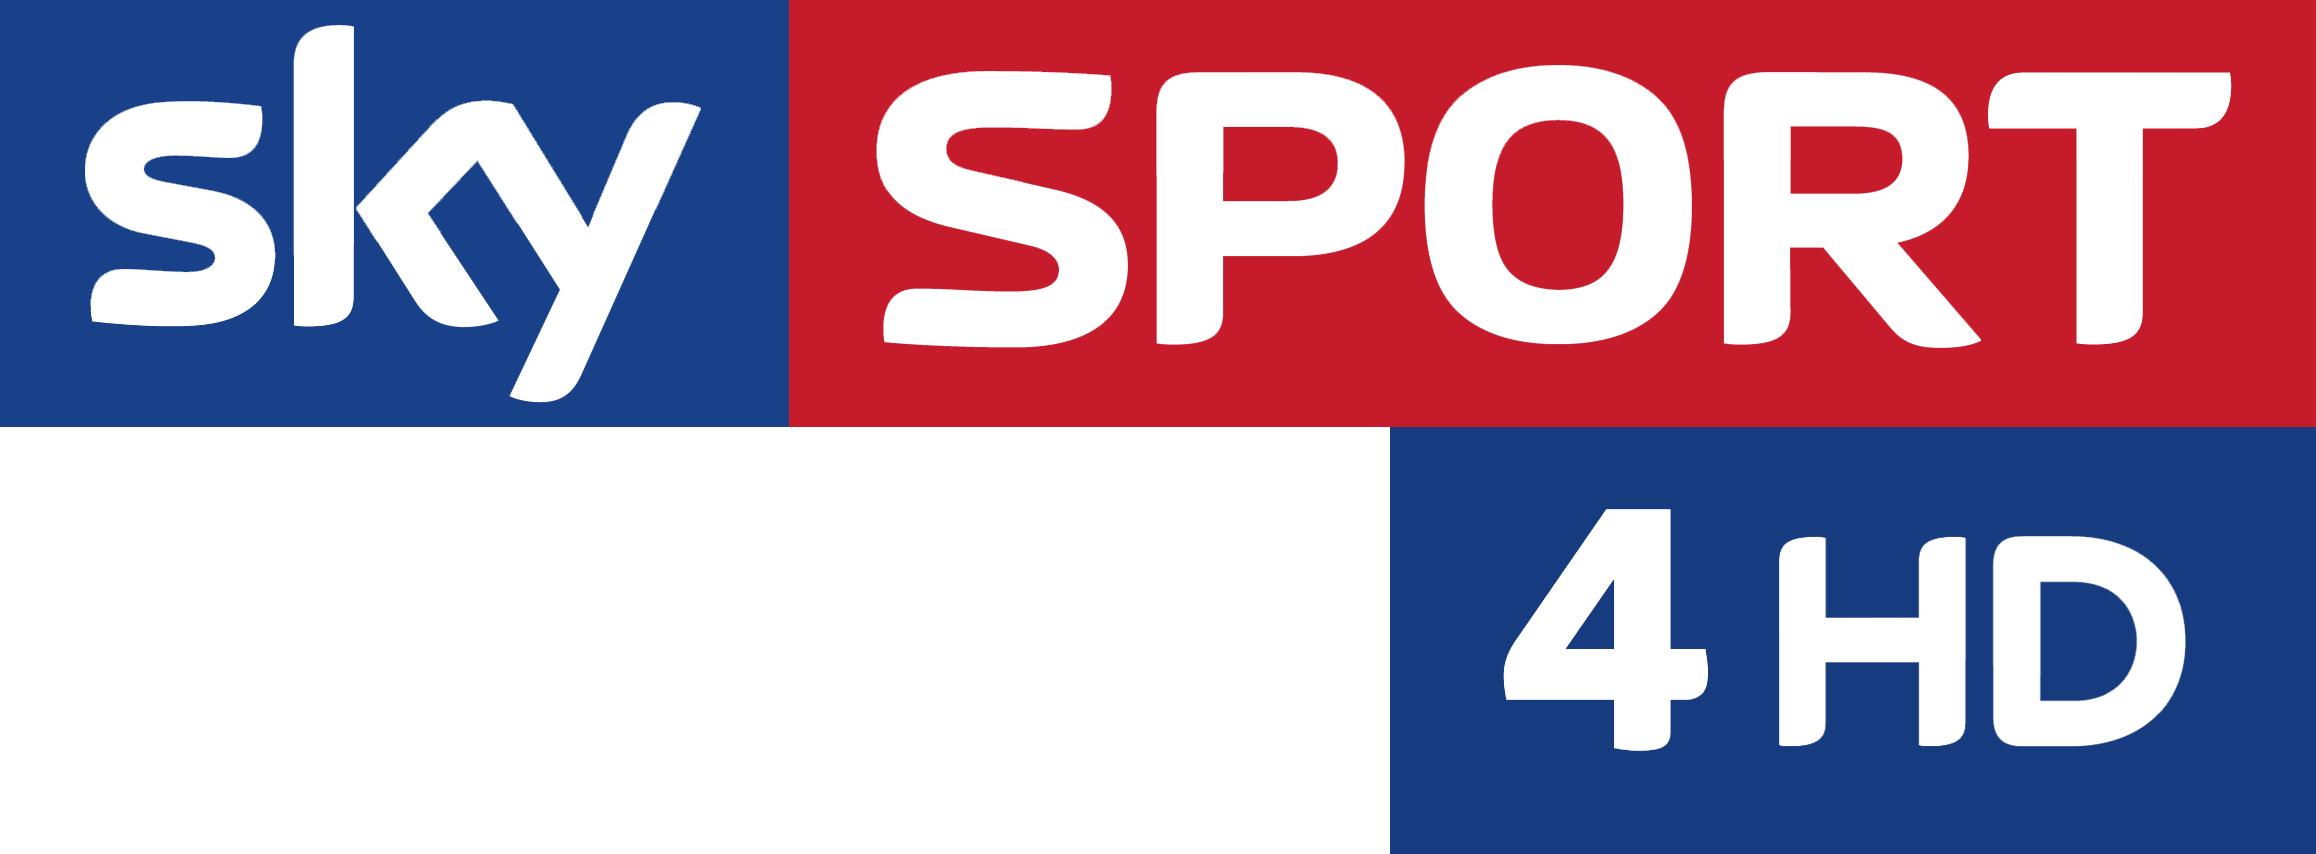 Sky Sport 4